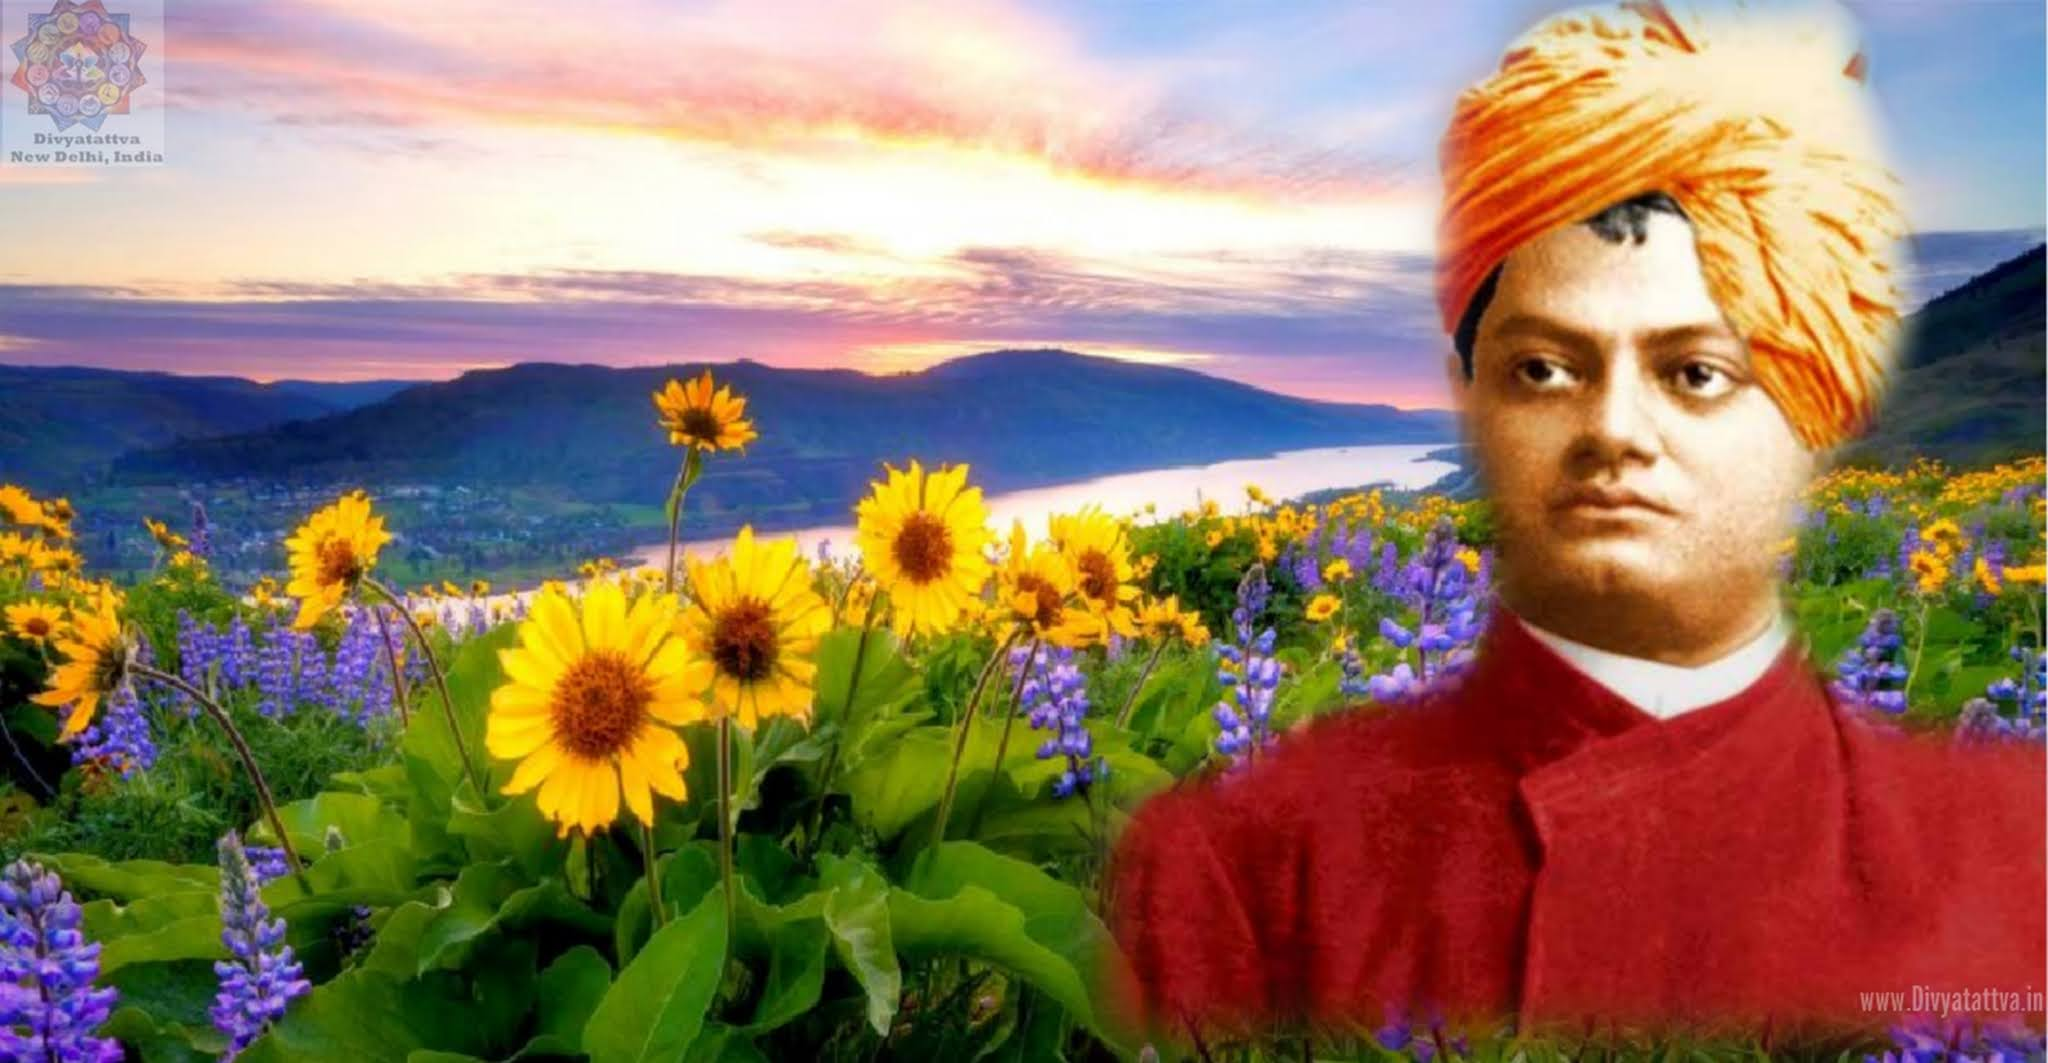 Swami Vivekananda 4K UHD Wallpapers Images Photos Teachings Quotes Inspiration Background Photos Pics Hindu Saint India Vivekananda Pictures Free